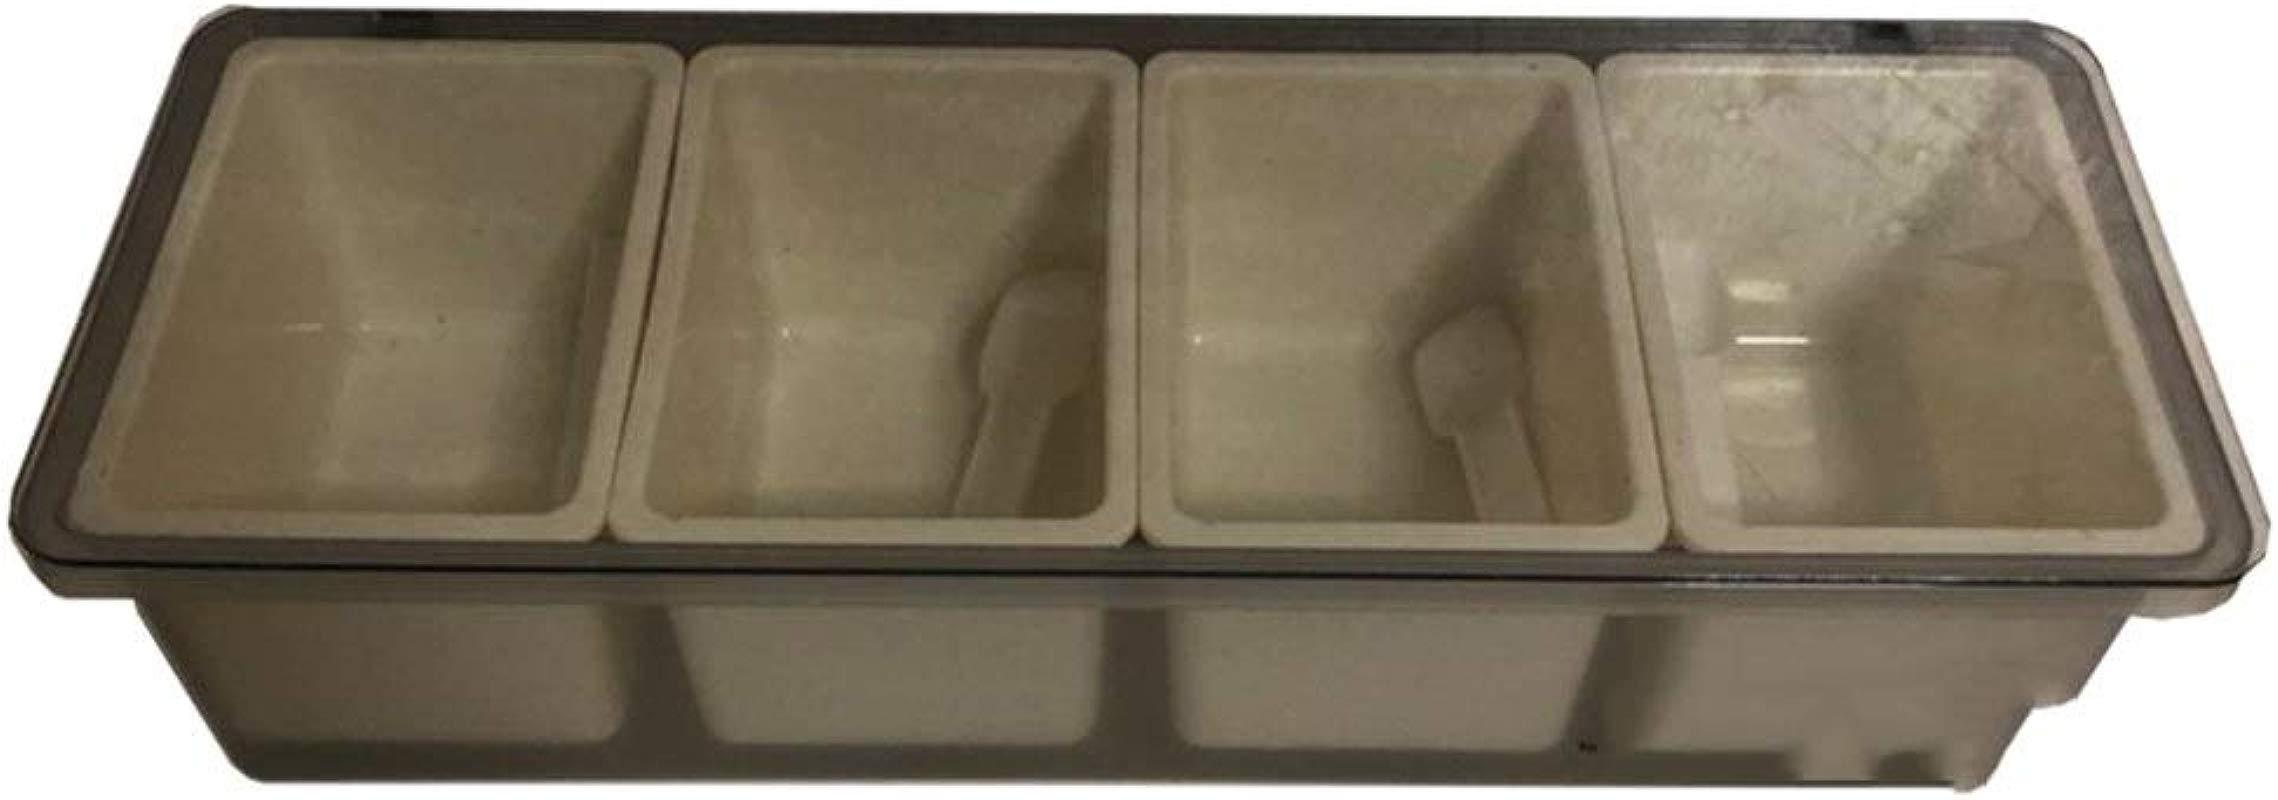 Kitchen Supplies Four Grid With Spoon Seasoning Storage Box Seasoning Jar Set Flip Plastic Seasoning Box Storage Household Color Grey